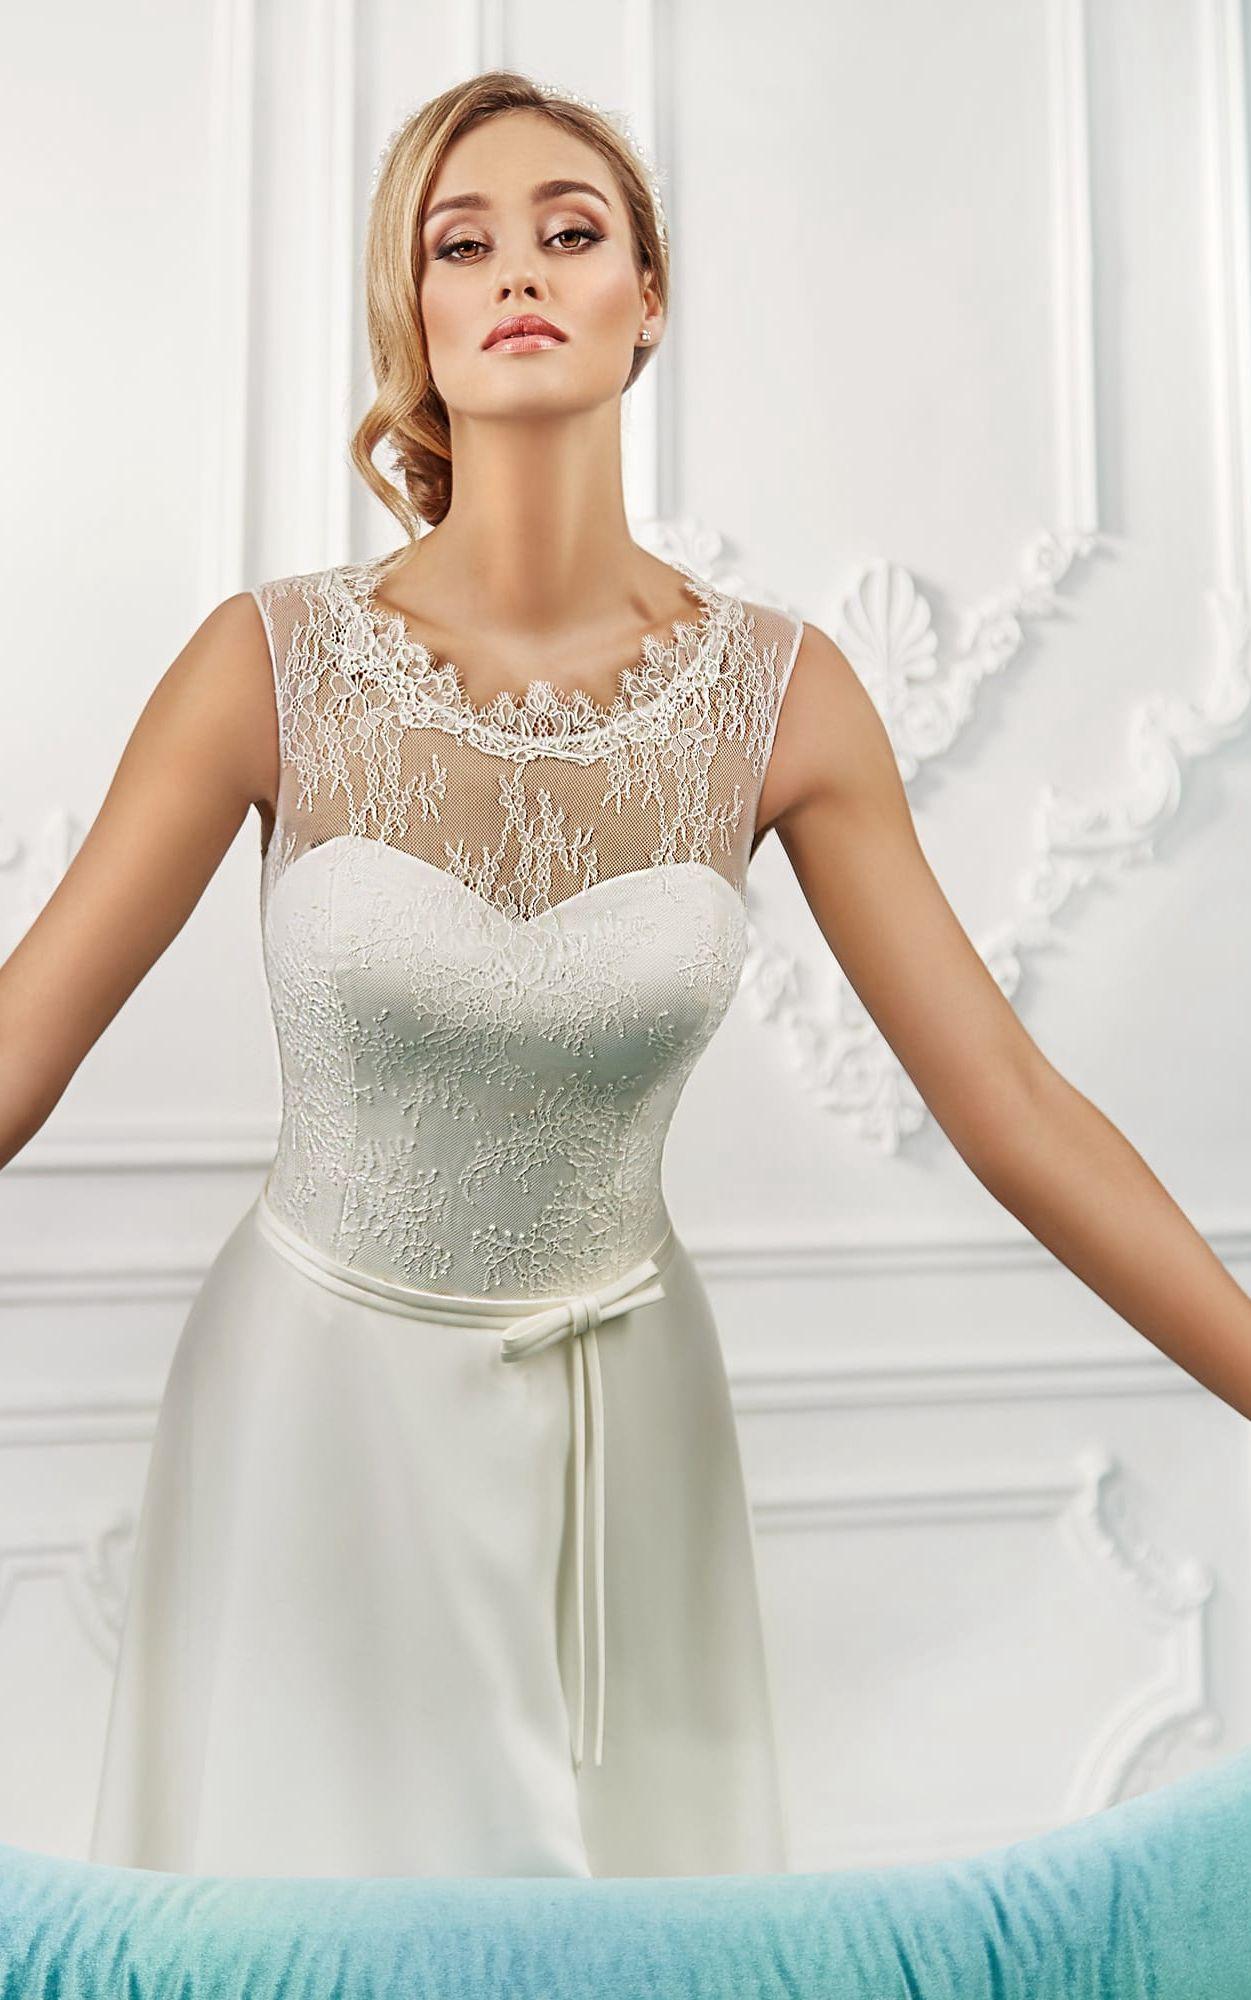 High neck sleeveless aline satin chiffon wedding dress with lace